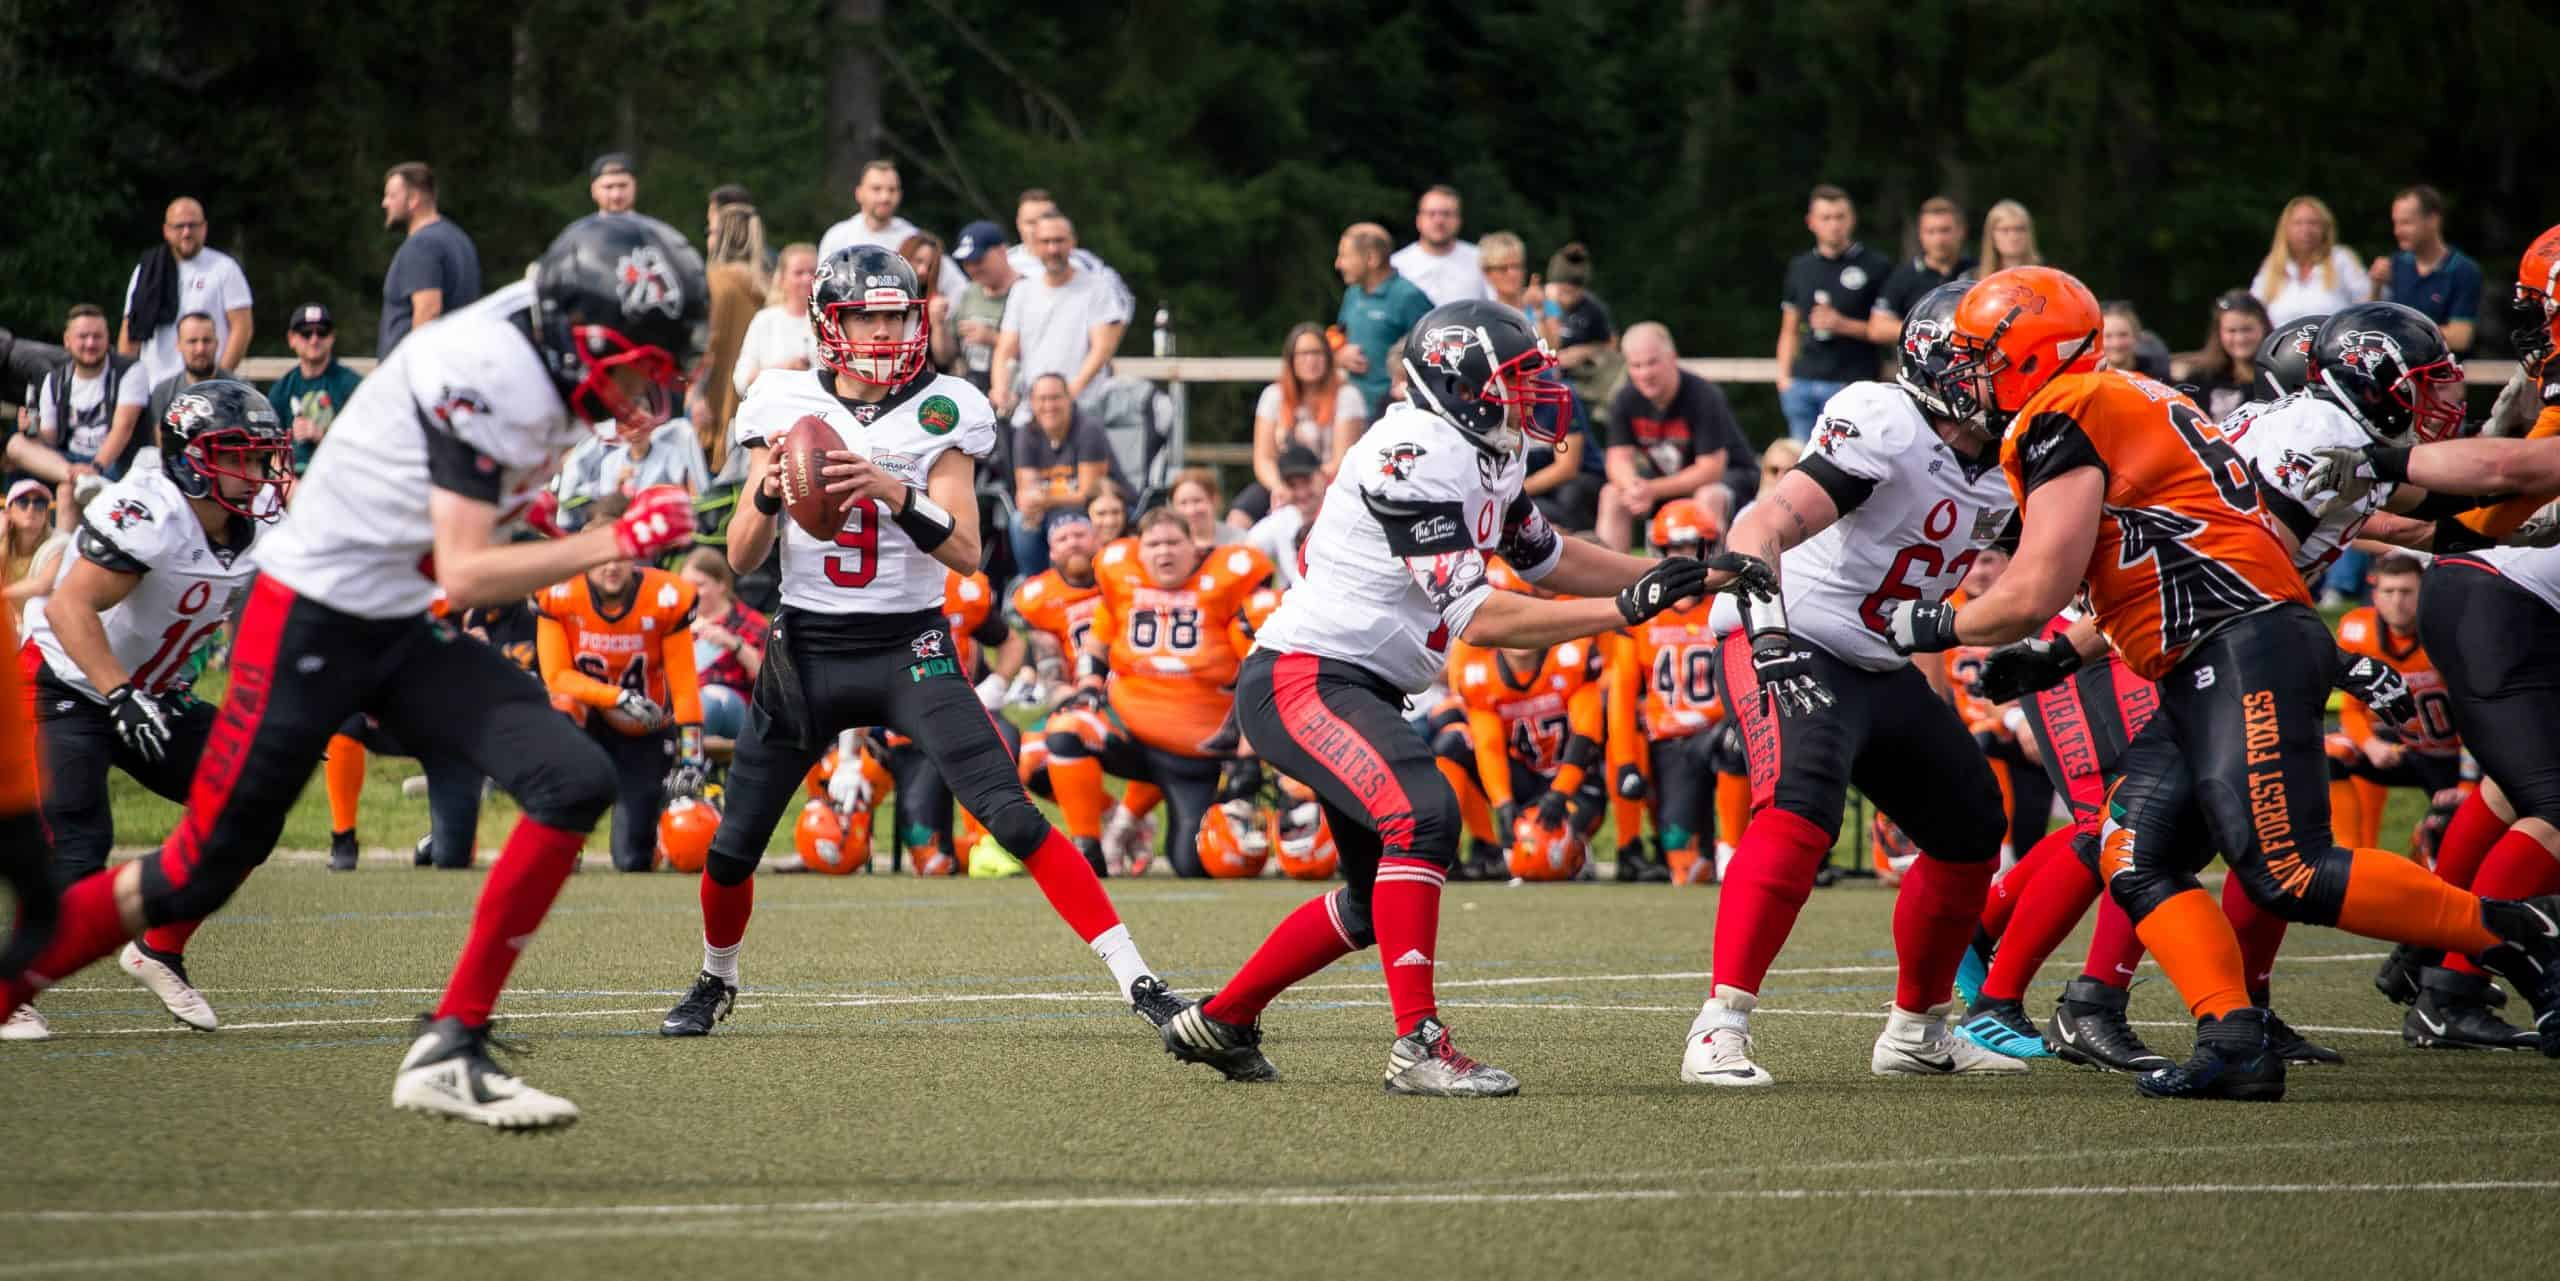 Konstanz Pirates - American Football - Foxes I